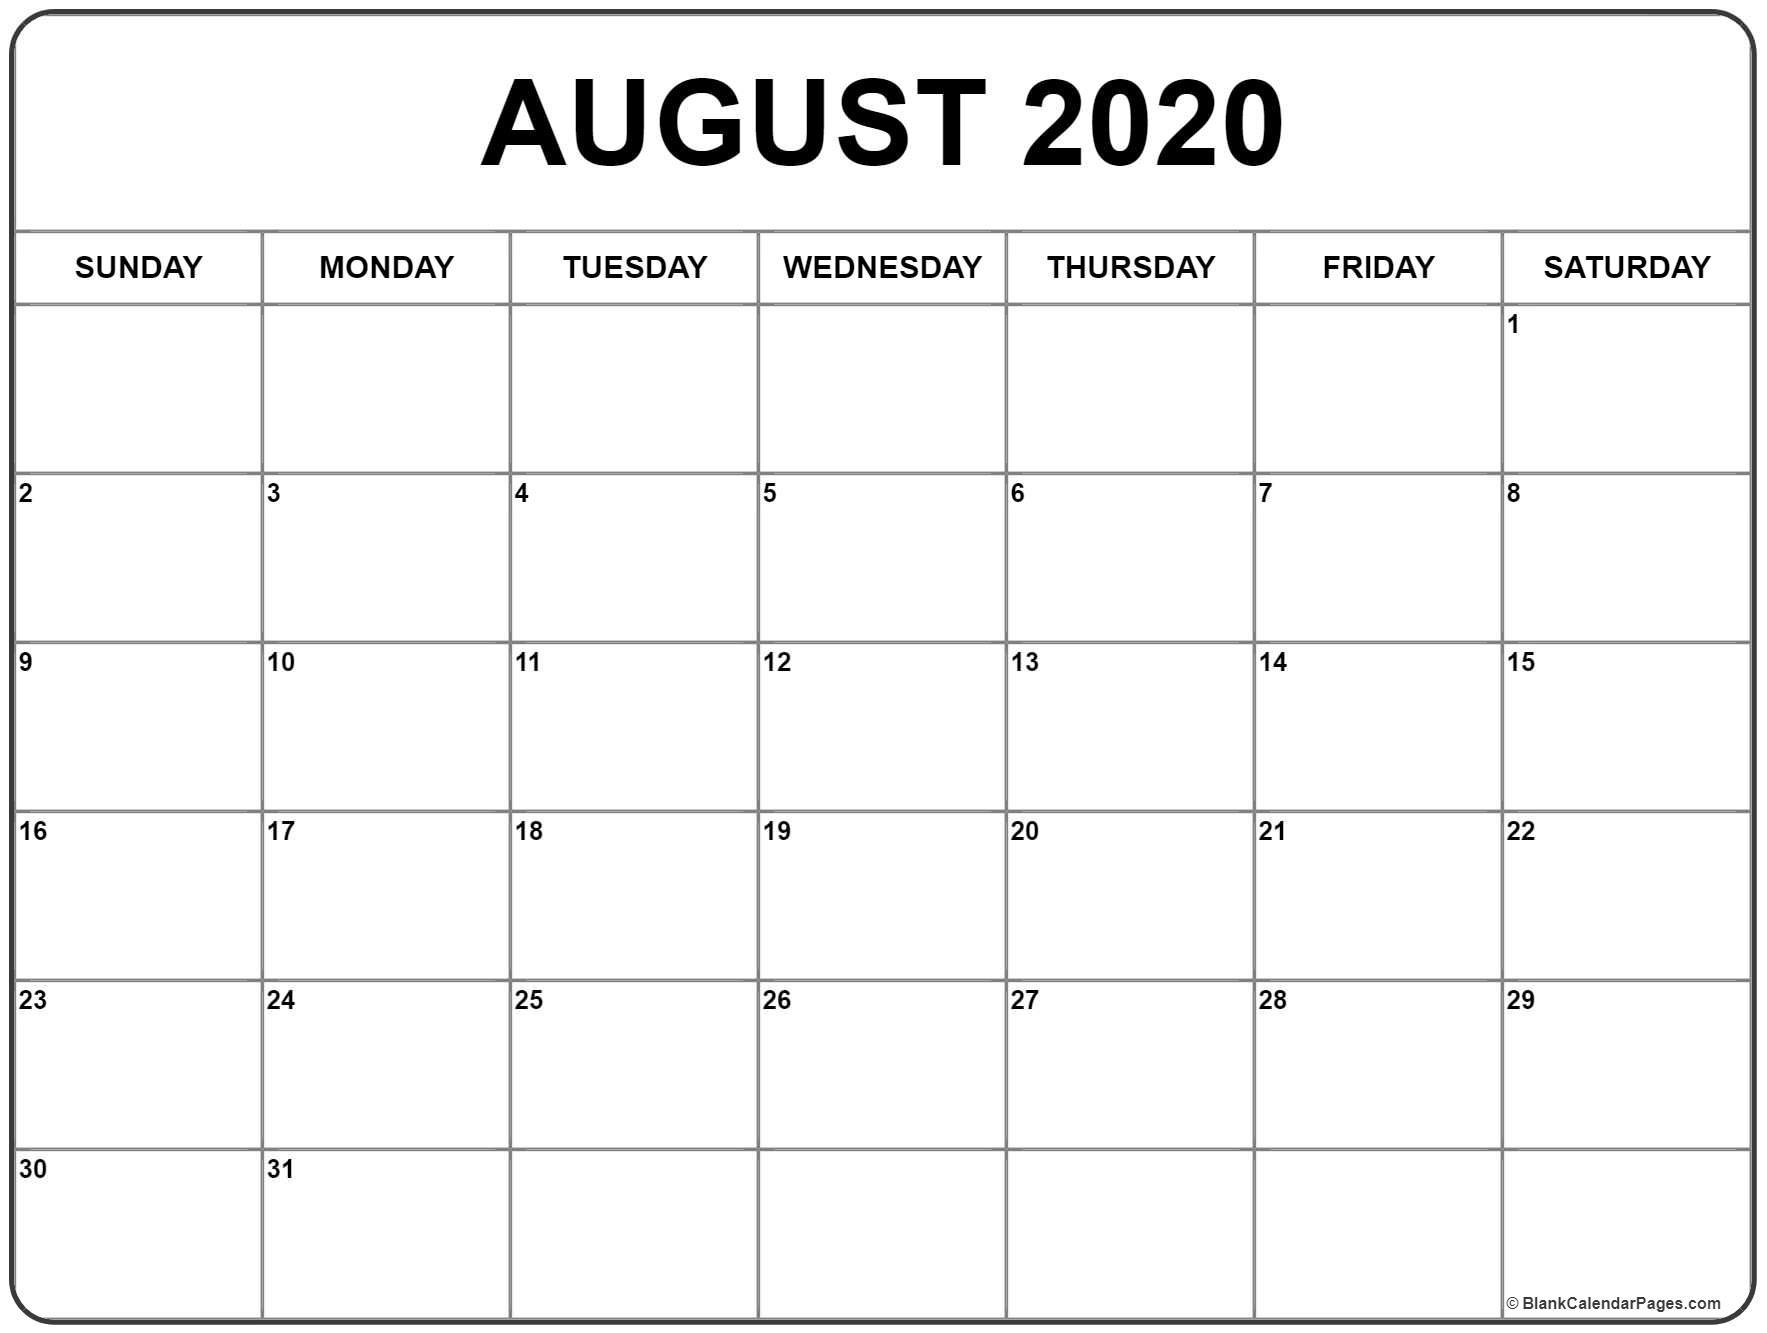 August 2020 Calendar | Free Printable Monthly Calendars_Blank Calendar Page August 2020